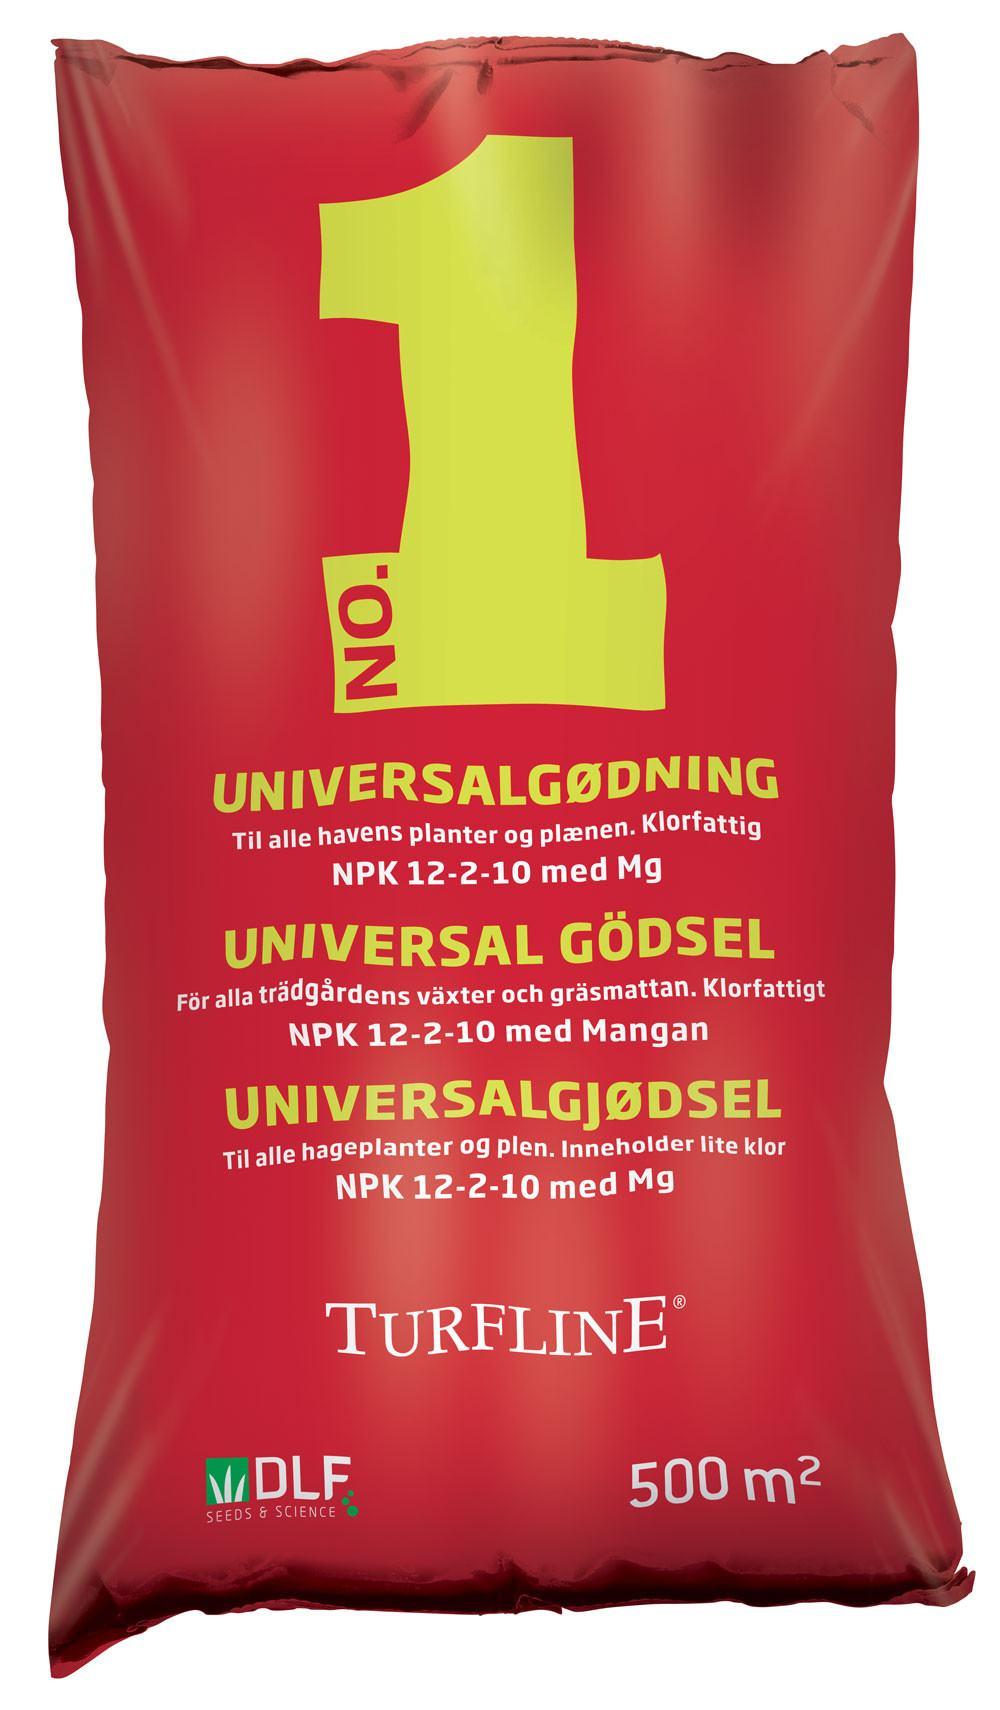 Turfline No. 1 Formula Universalgødning, 15 kg. / 500 m2